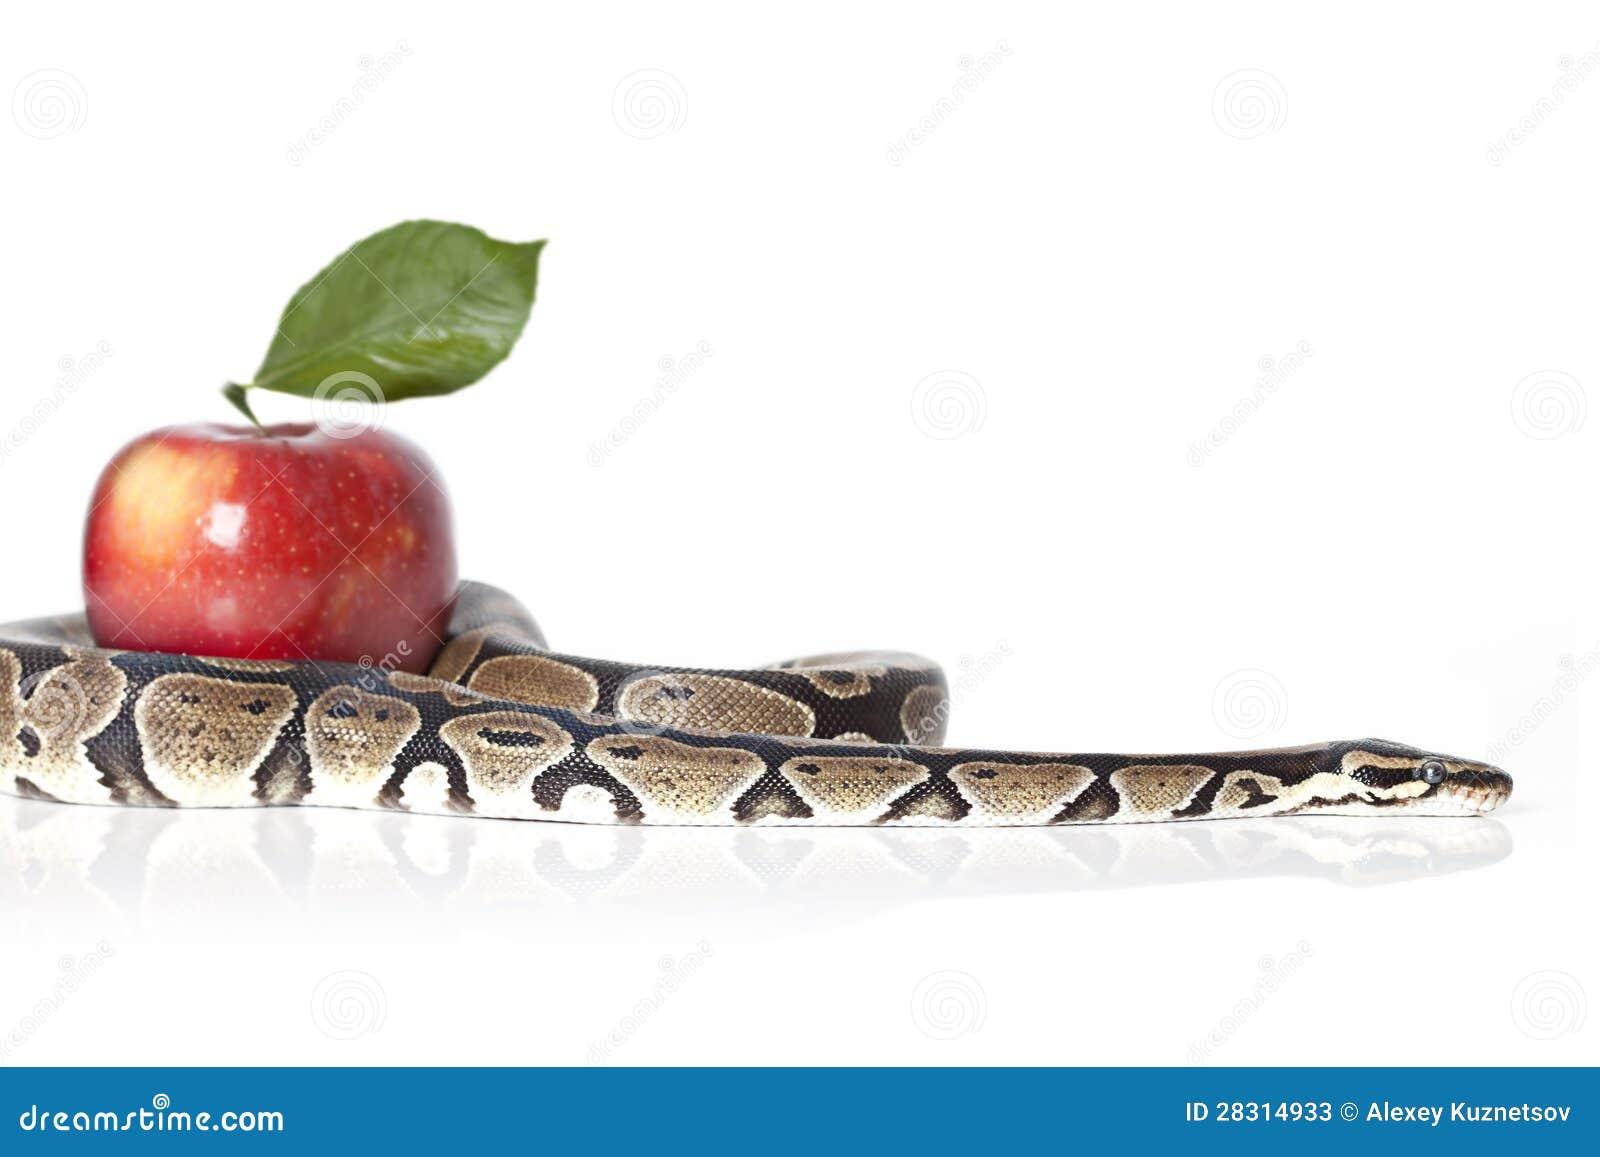 Pythonschlange mit rotem Apfel